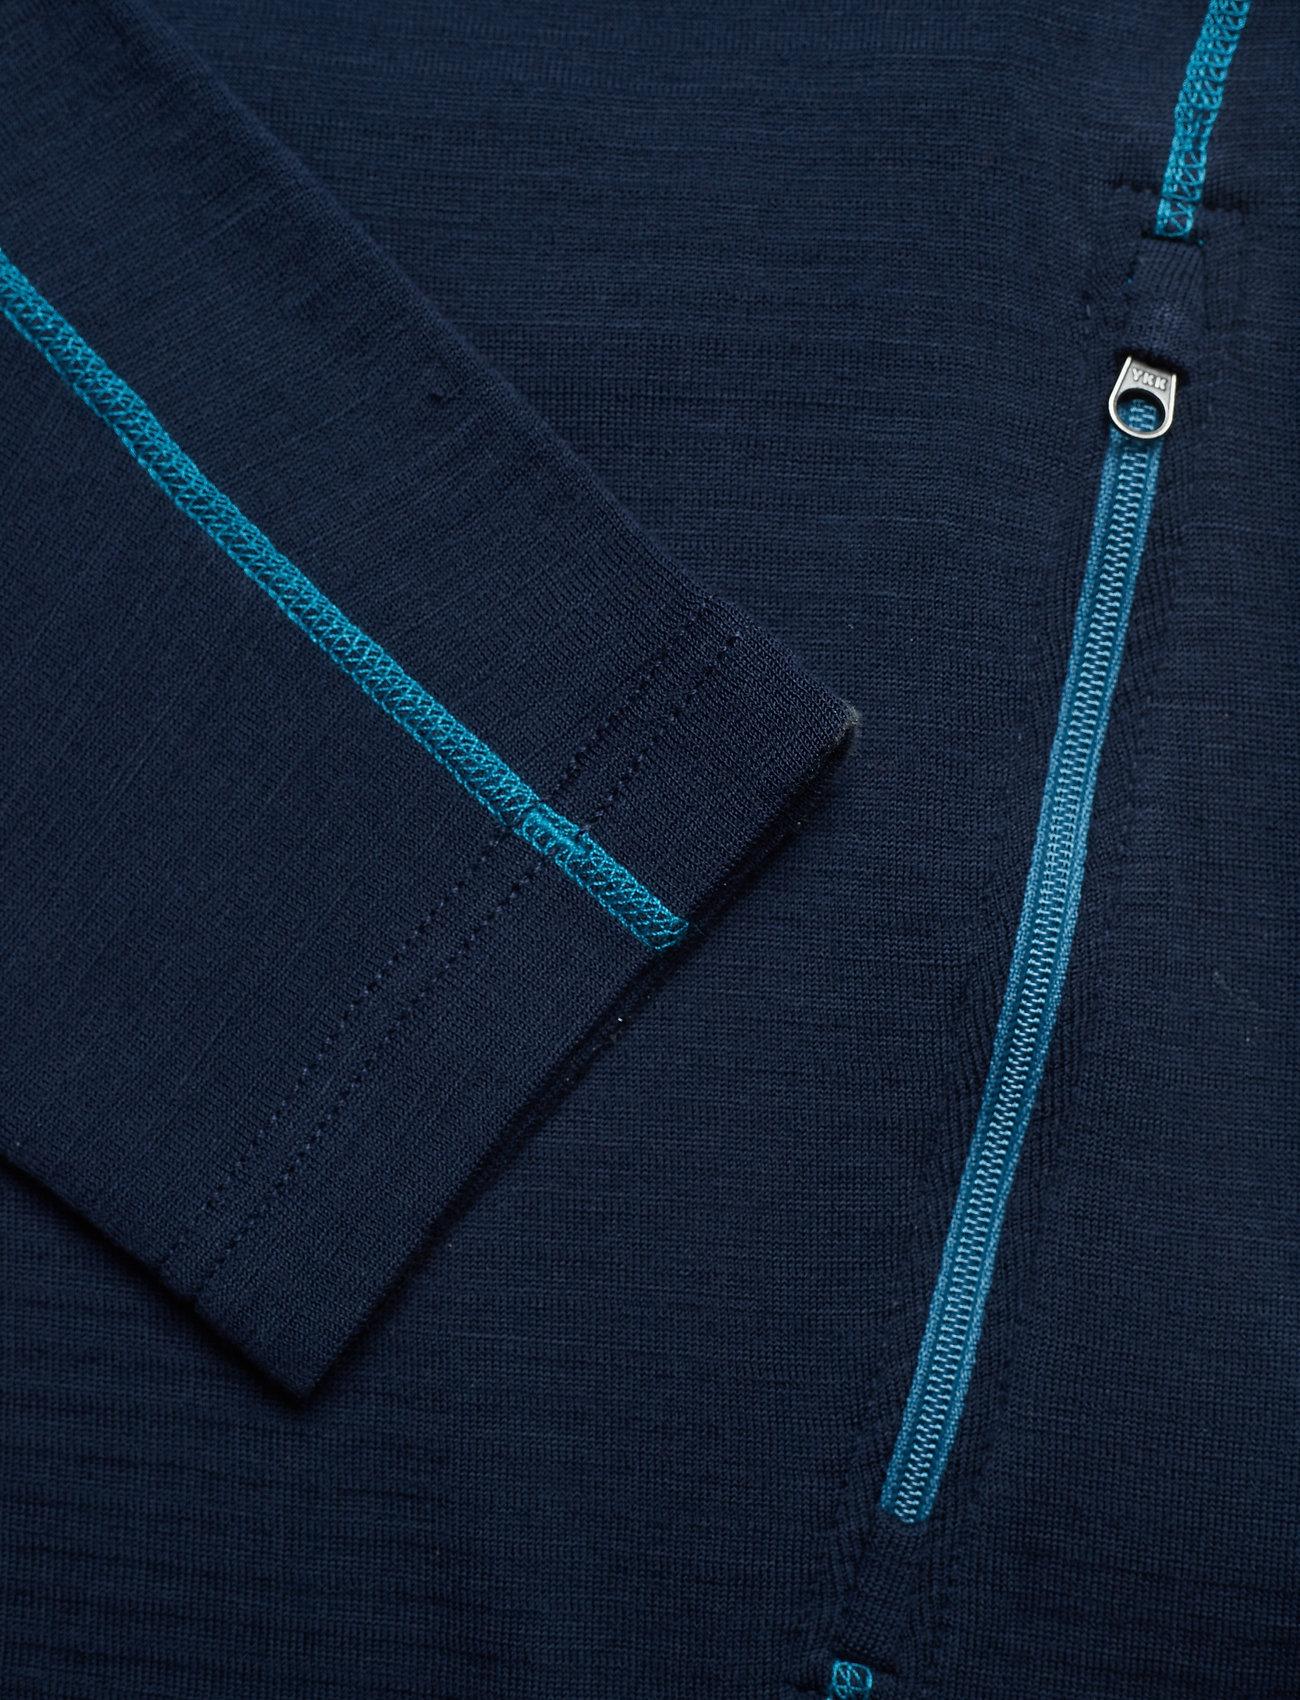 Houdini M's Wooler Houdi college grey S - Sweatshirts BLUE ILLUSION - Menn Klær